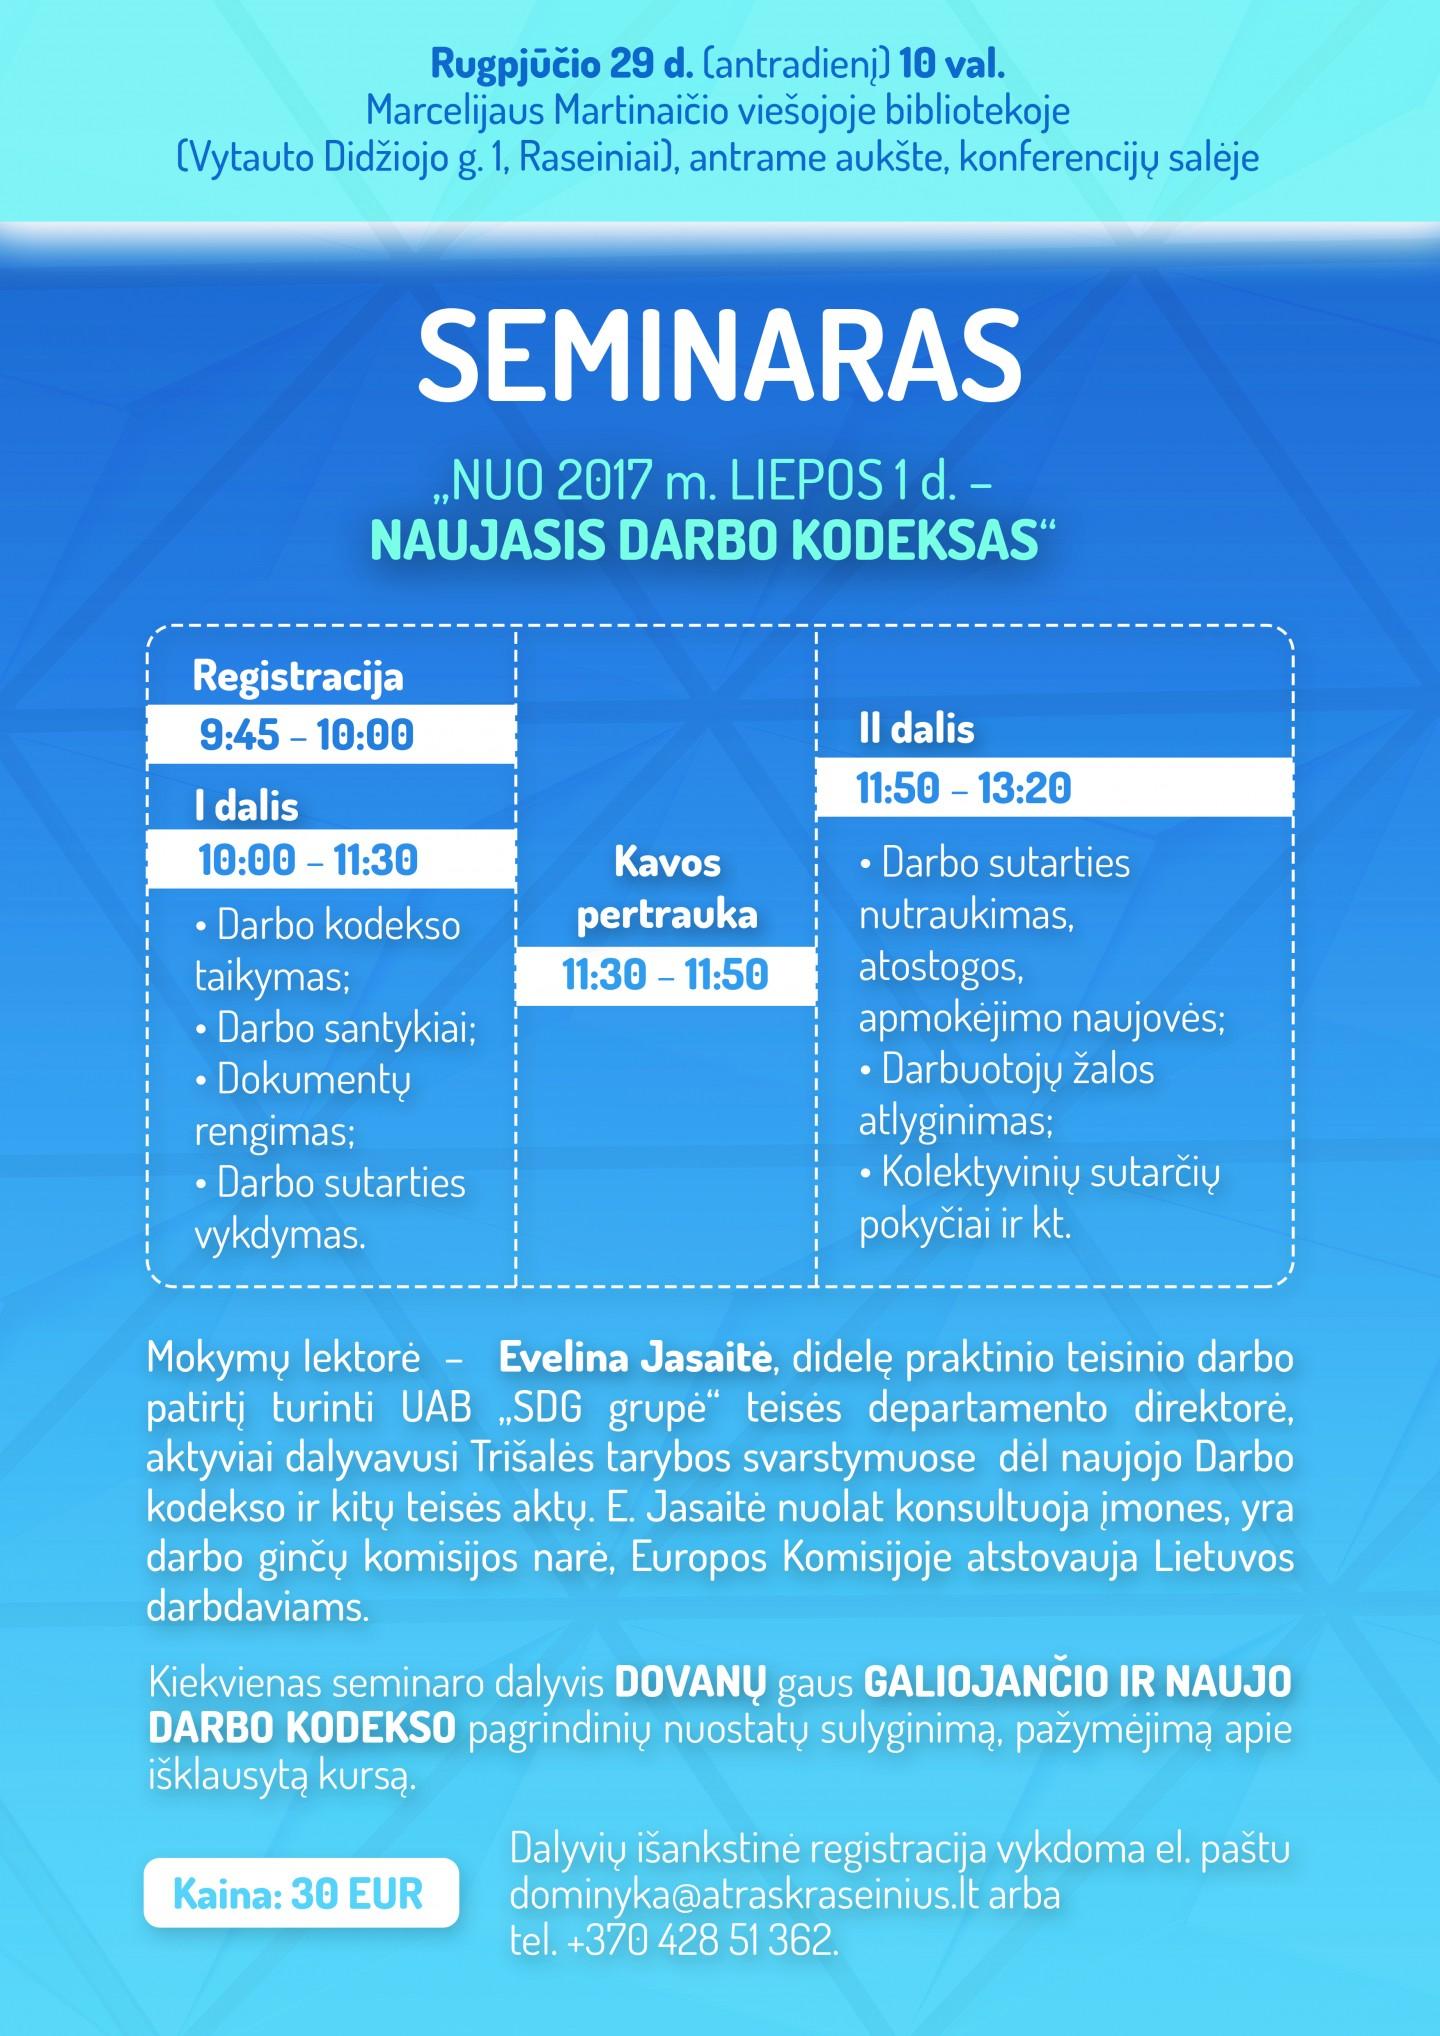 Seminaras A3 uai 1440x2036 1